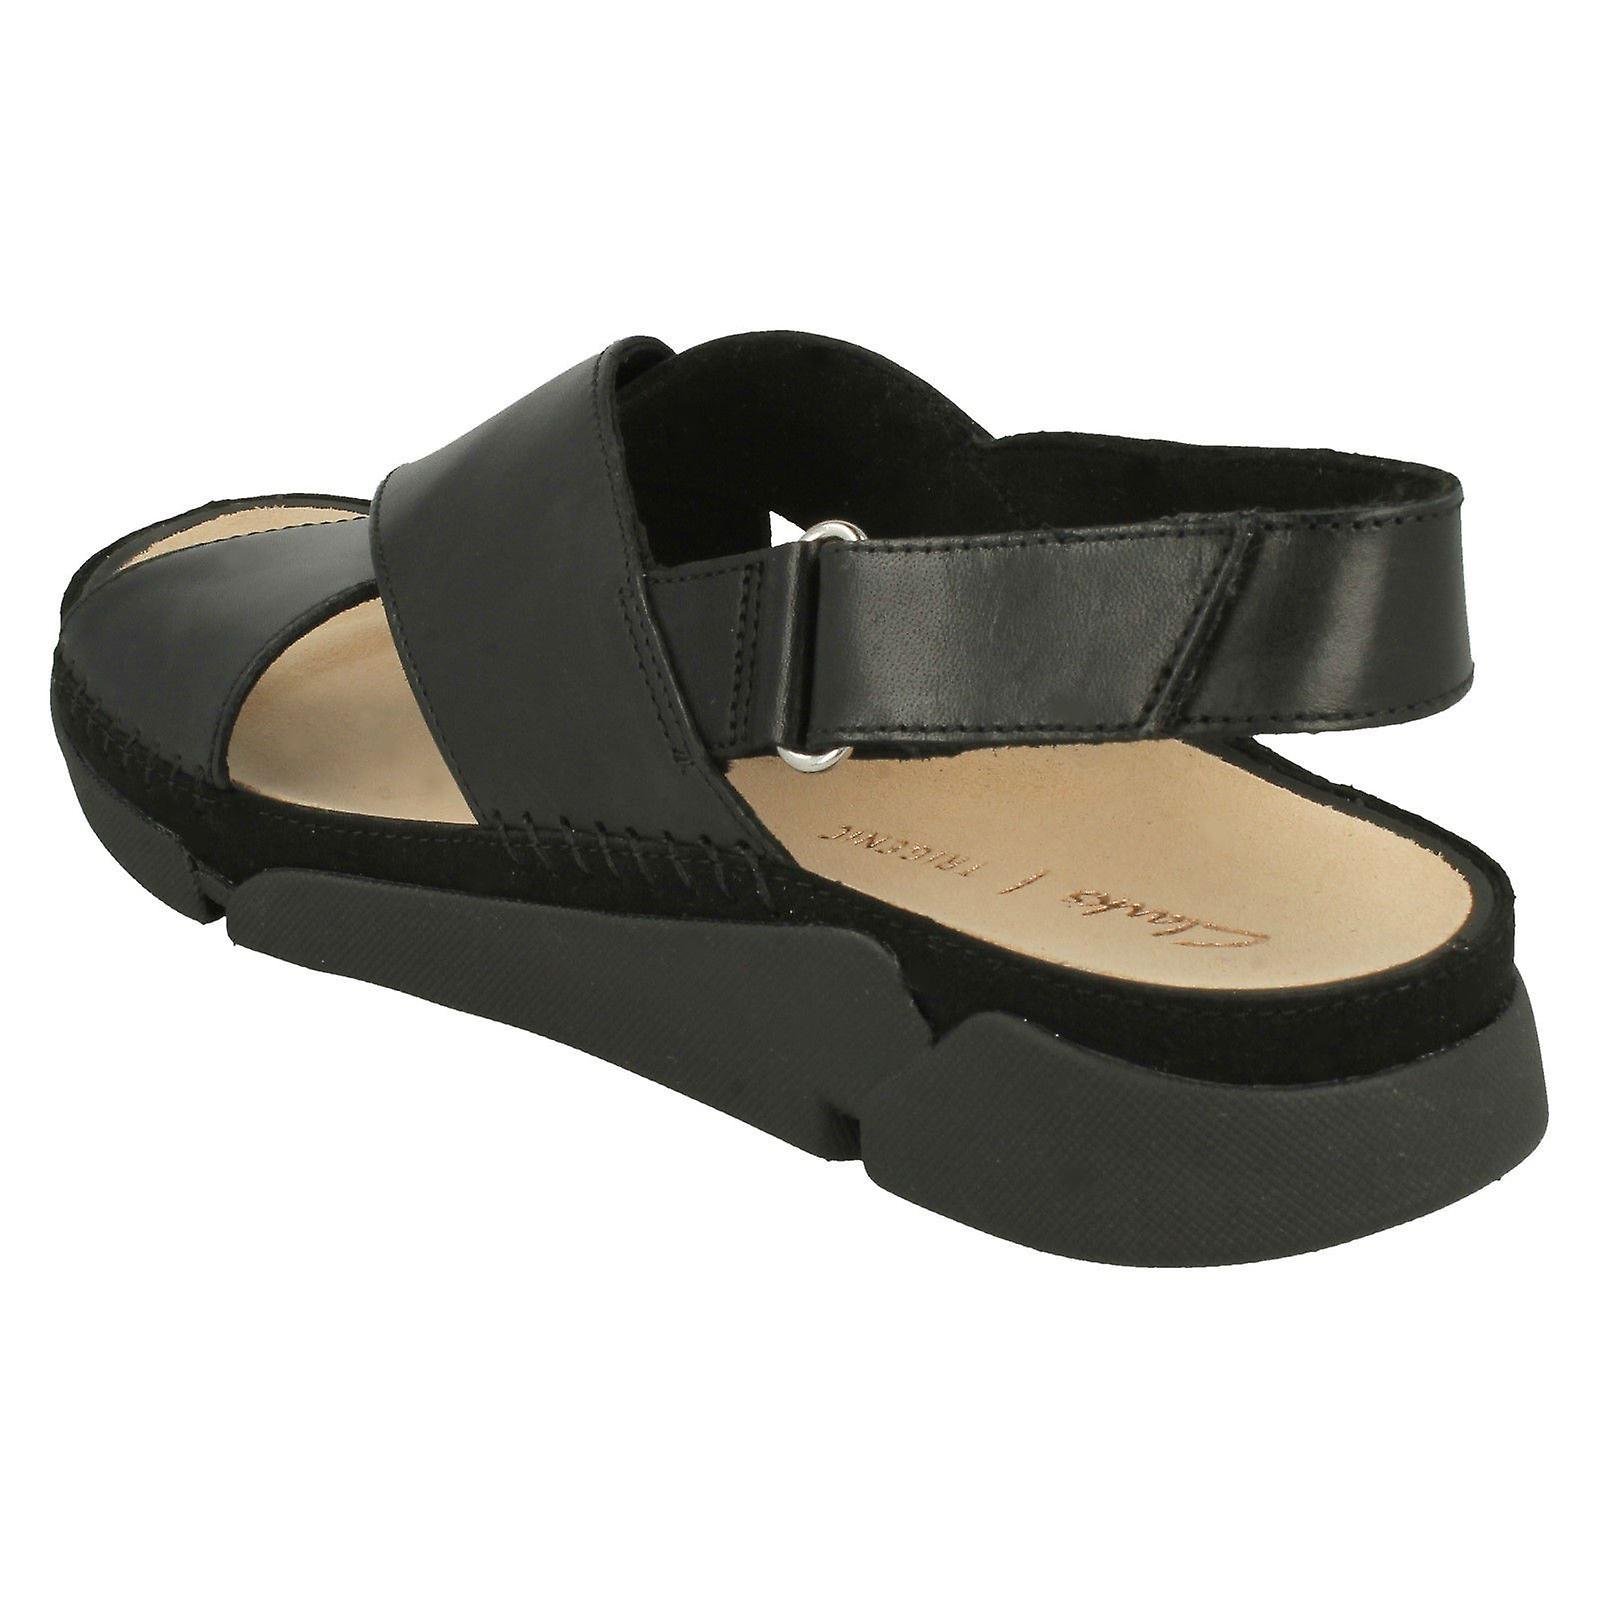 Ladies Clarks Casual Sommer Sandaler Tri Alexia